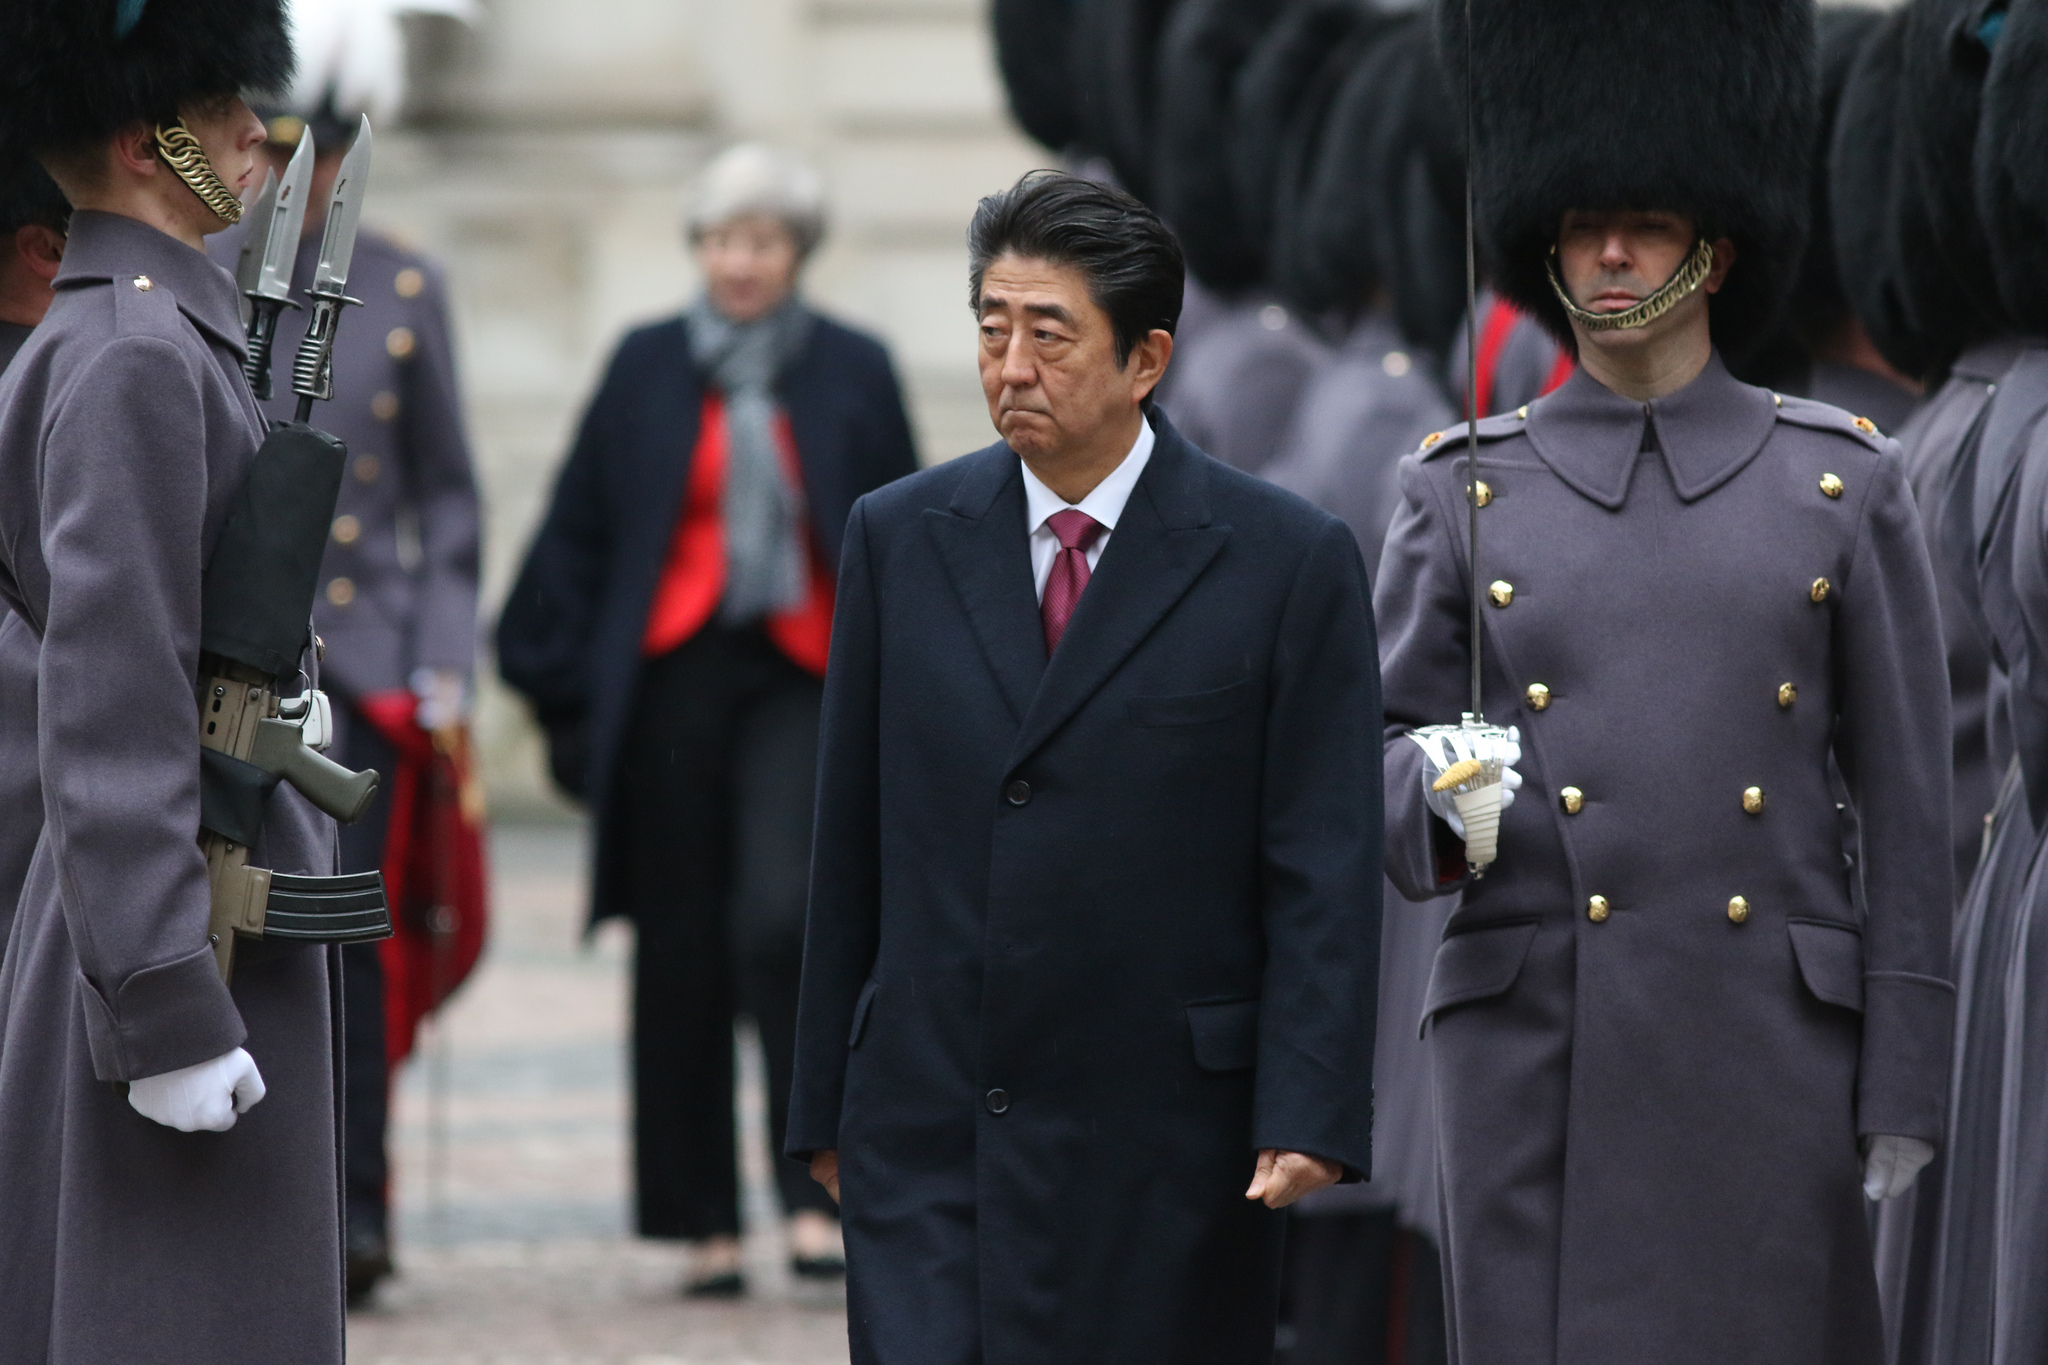 Prime Minister of Japan Shinzo Abe